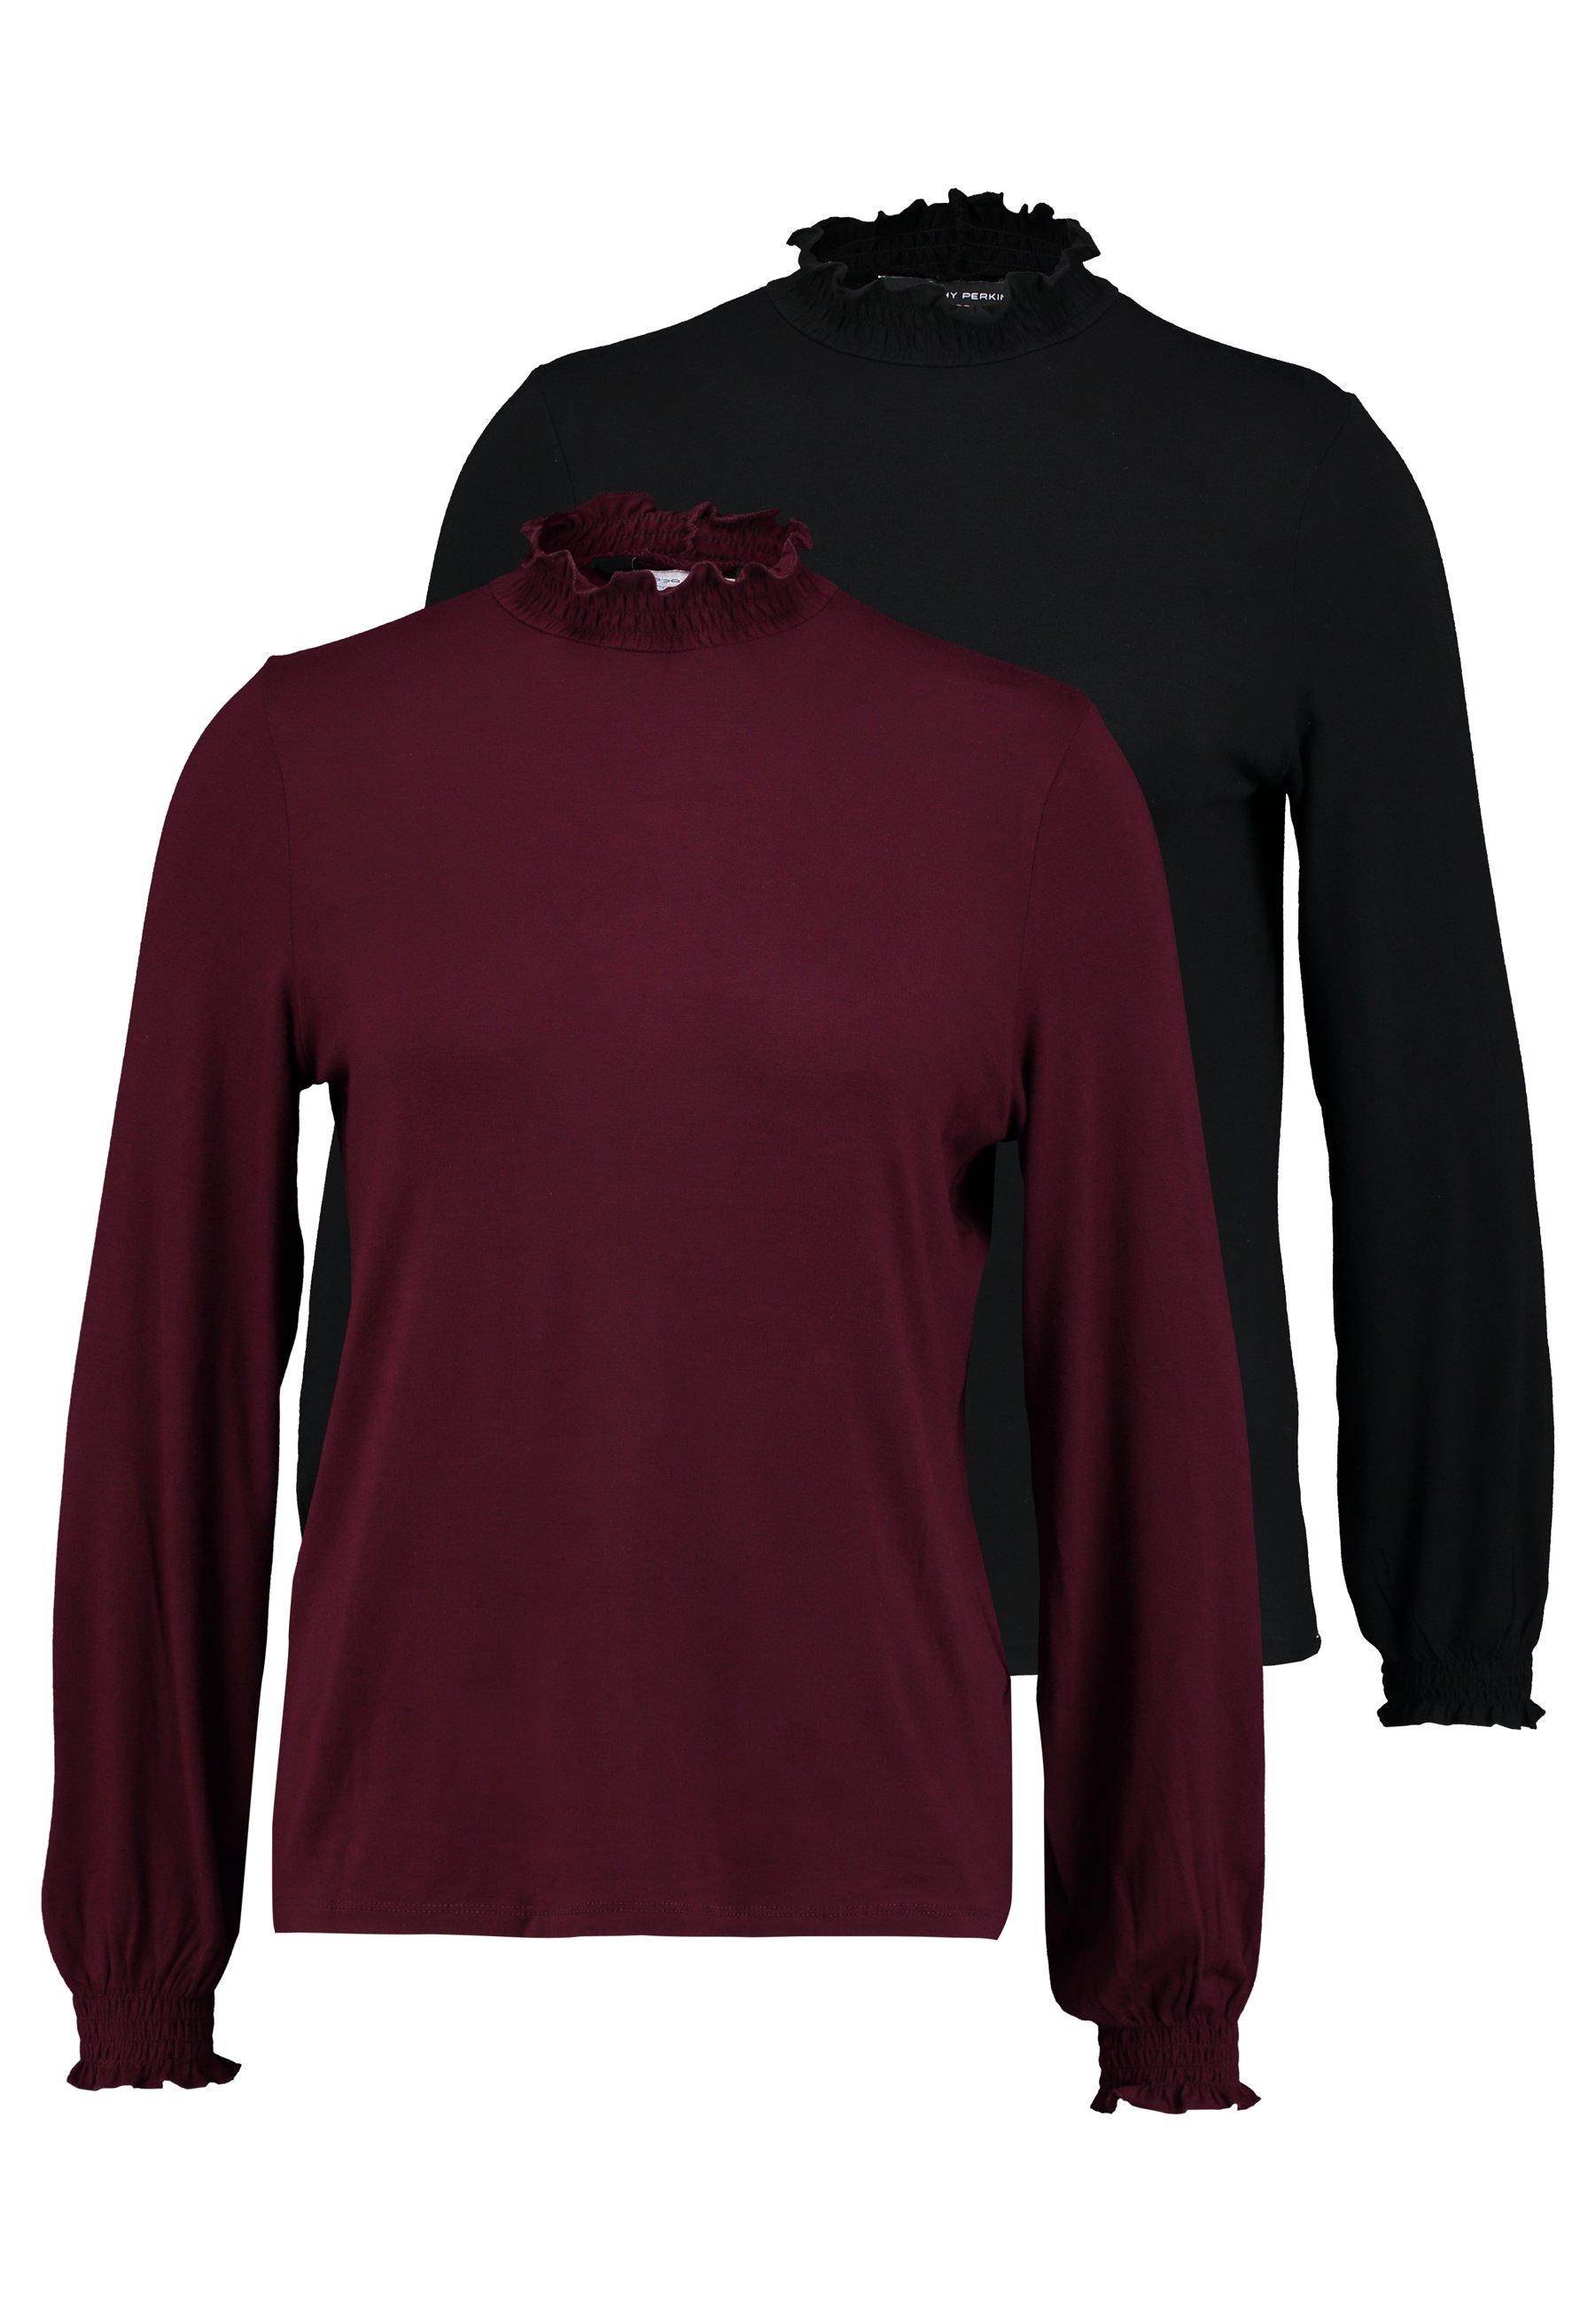 Black 2 Manches Neck PackT Longues berry À Perkins Frilled Dorothy shirt 4AScjLq5R3